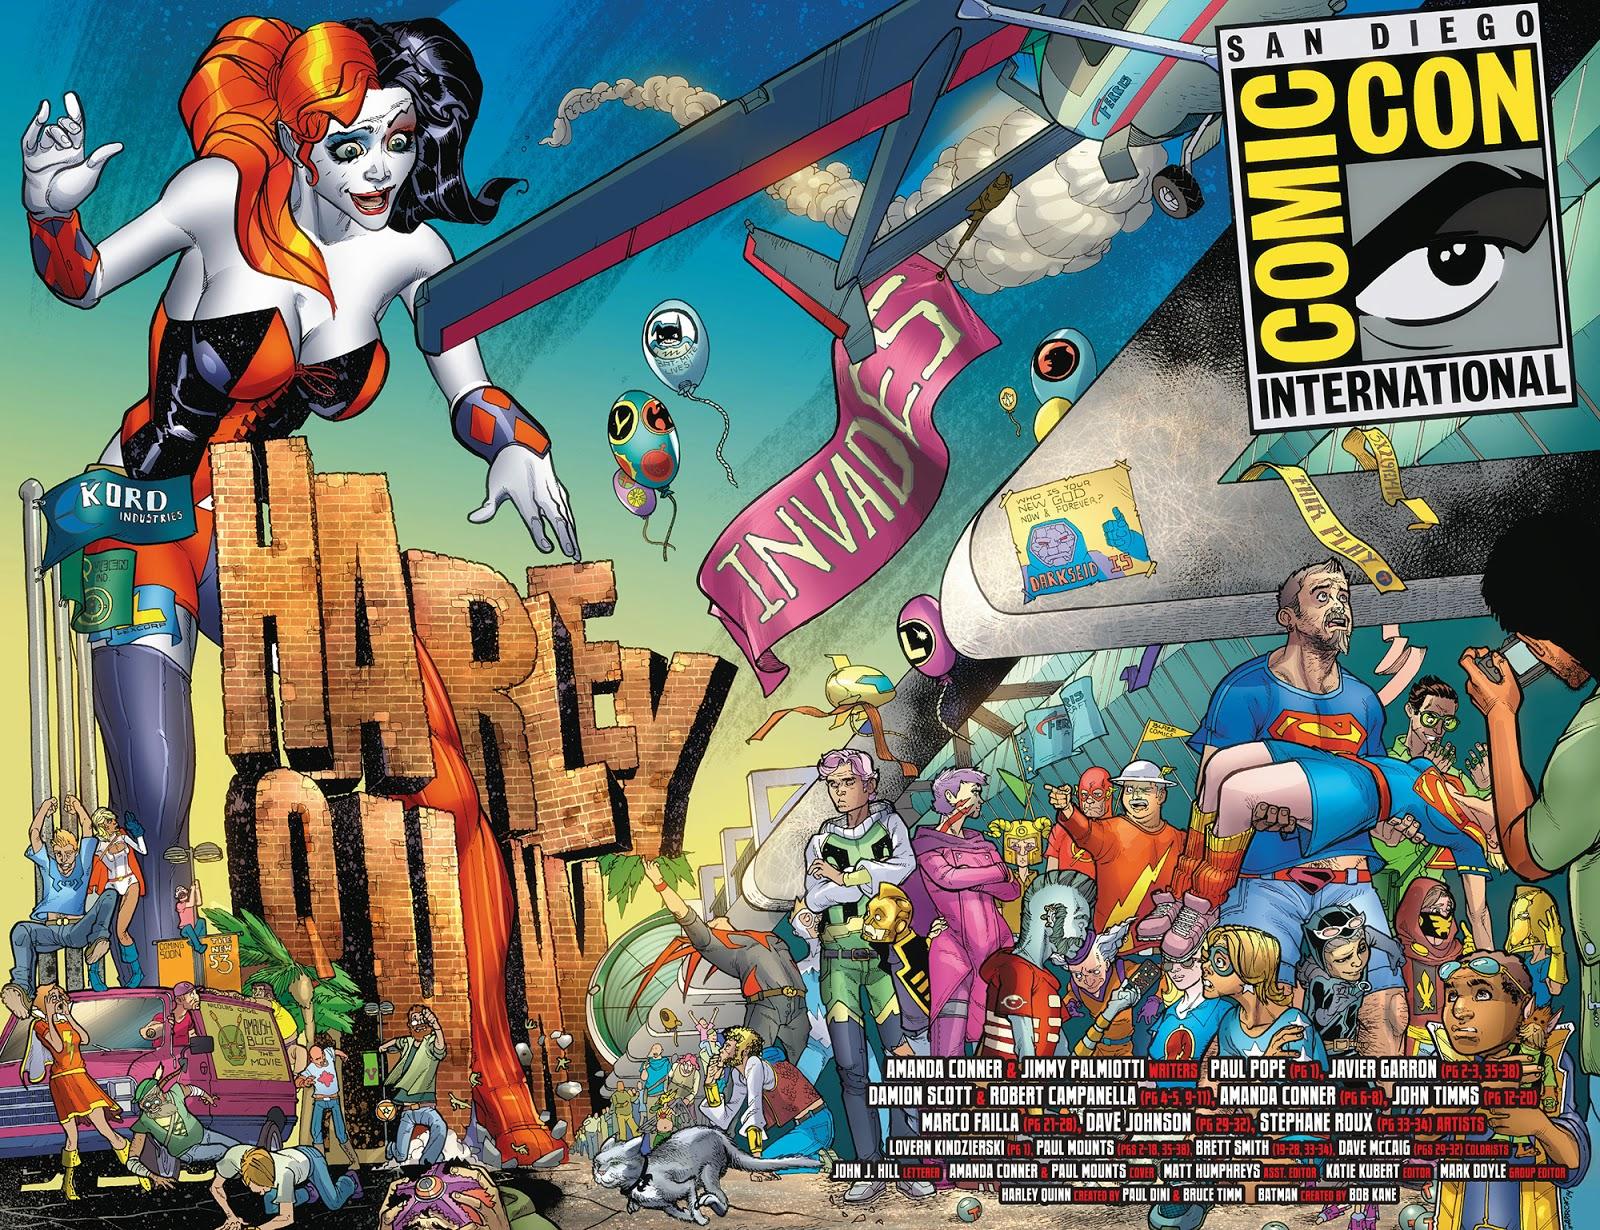 harley quinn invades comic con 001 2014 viewcomic reading comics